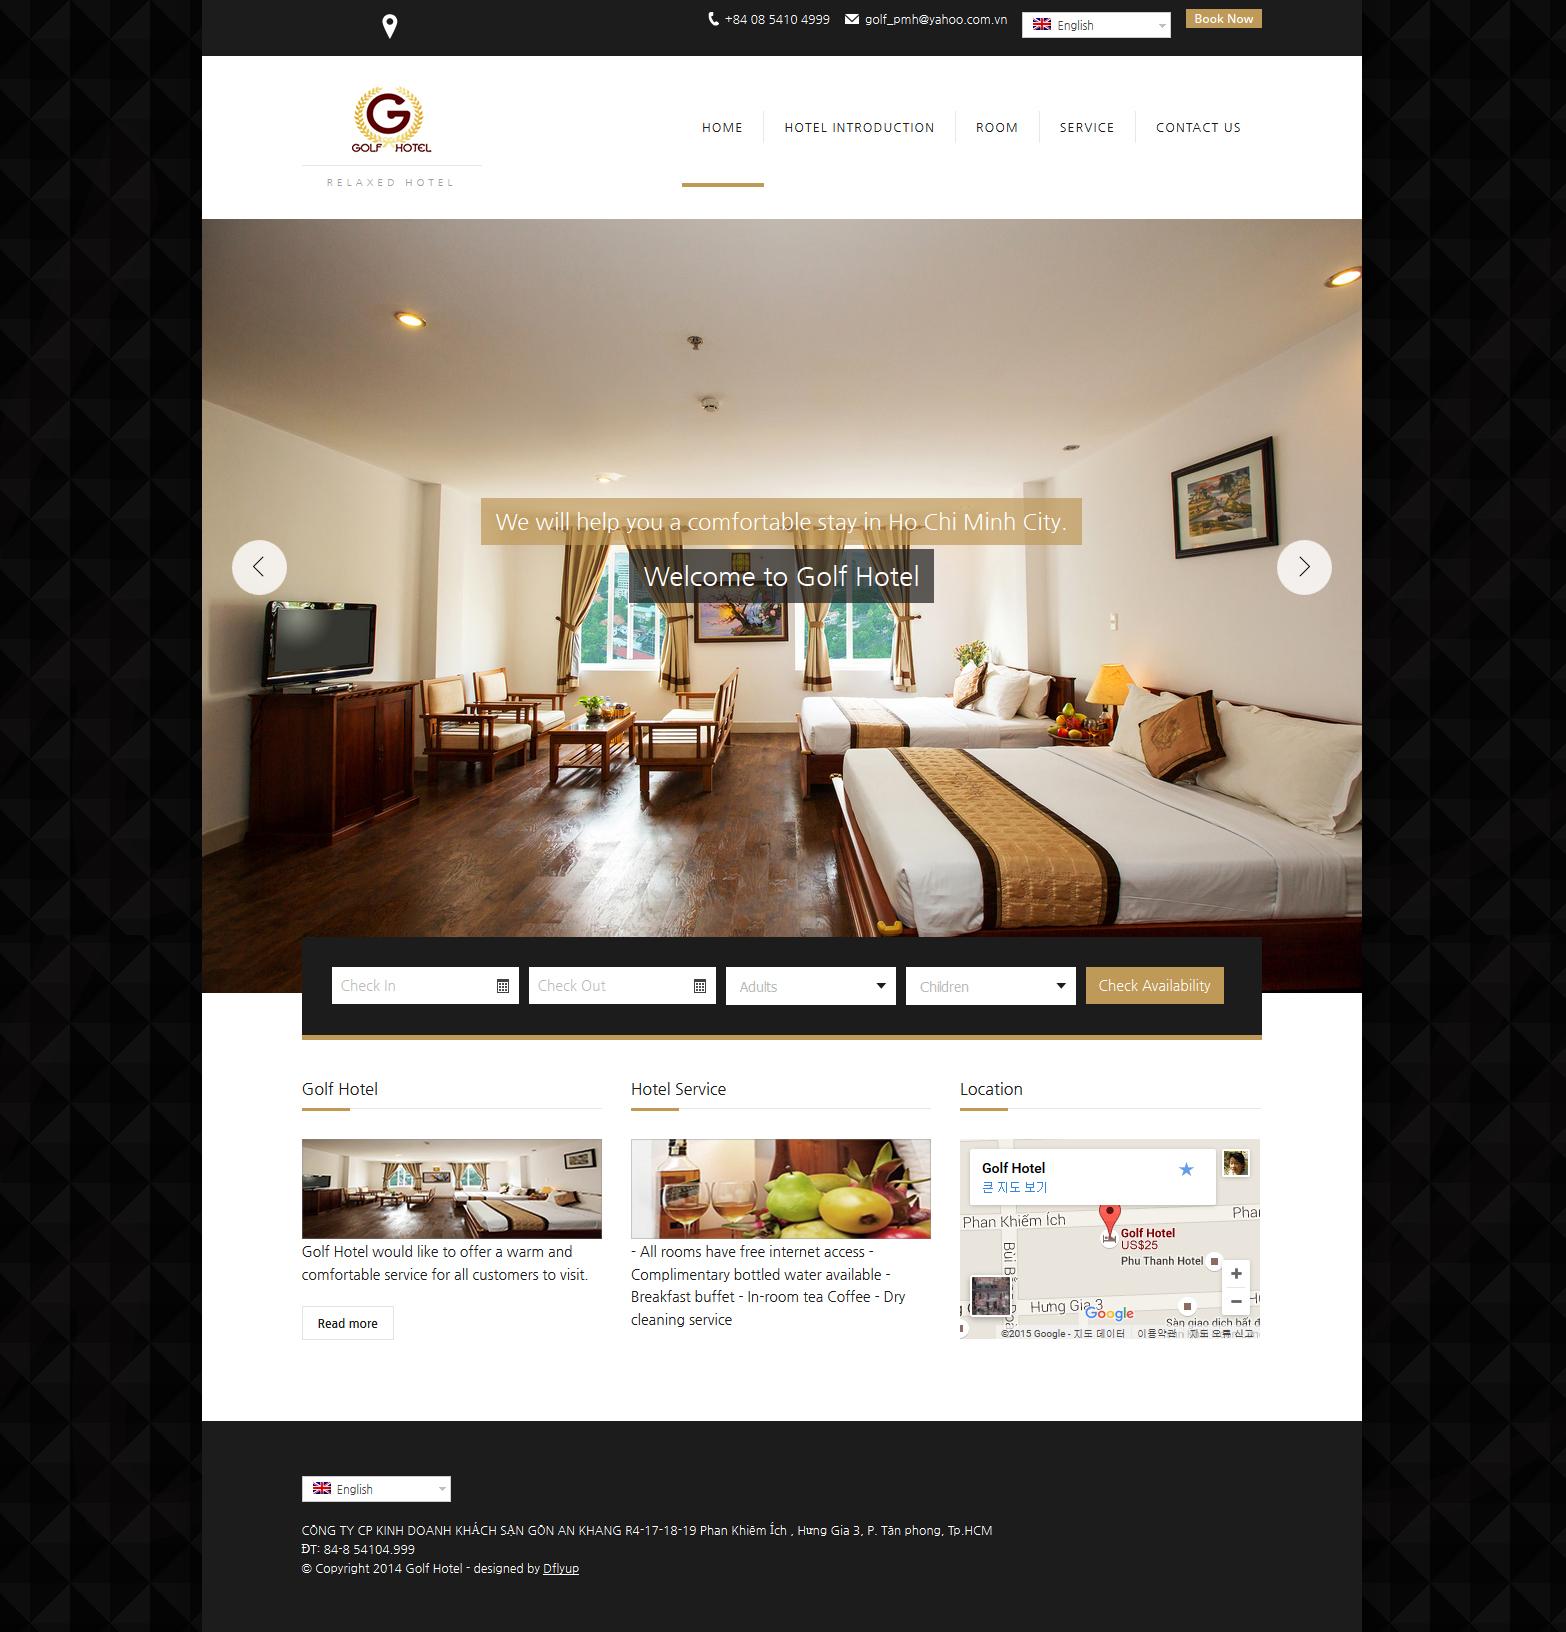 golf hotel website design, wordpress website design in vietnam,호텔 홈페이지 디자인, 워드프레스 웹사이트 가격